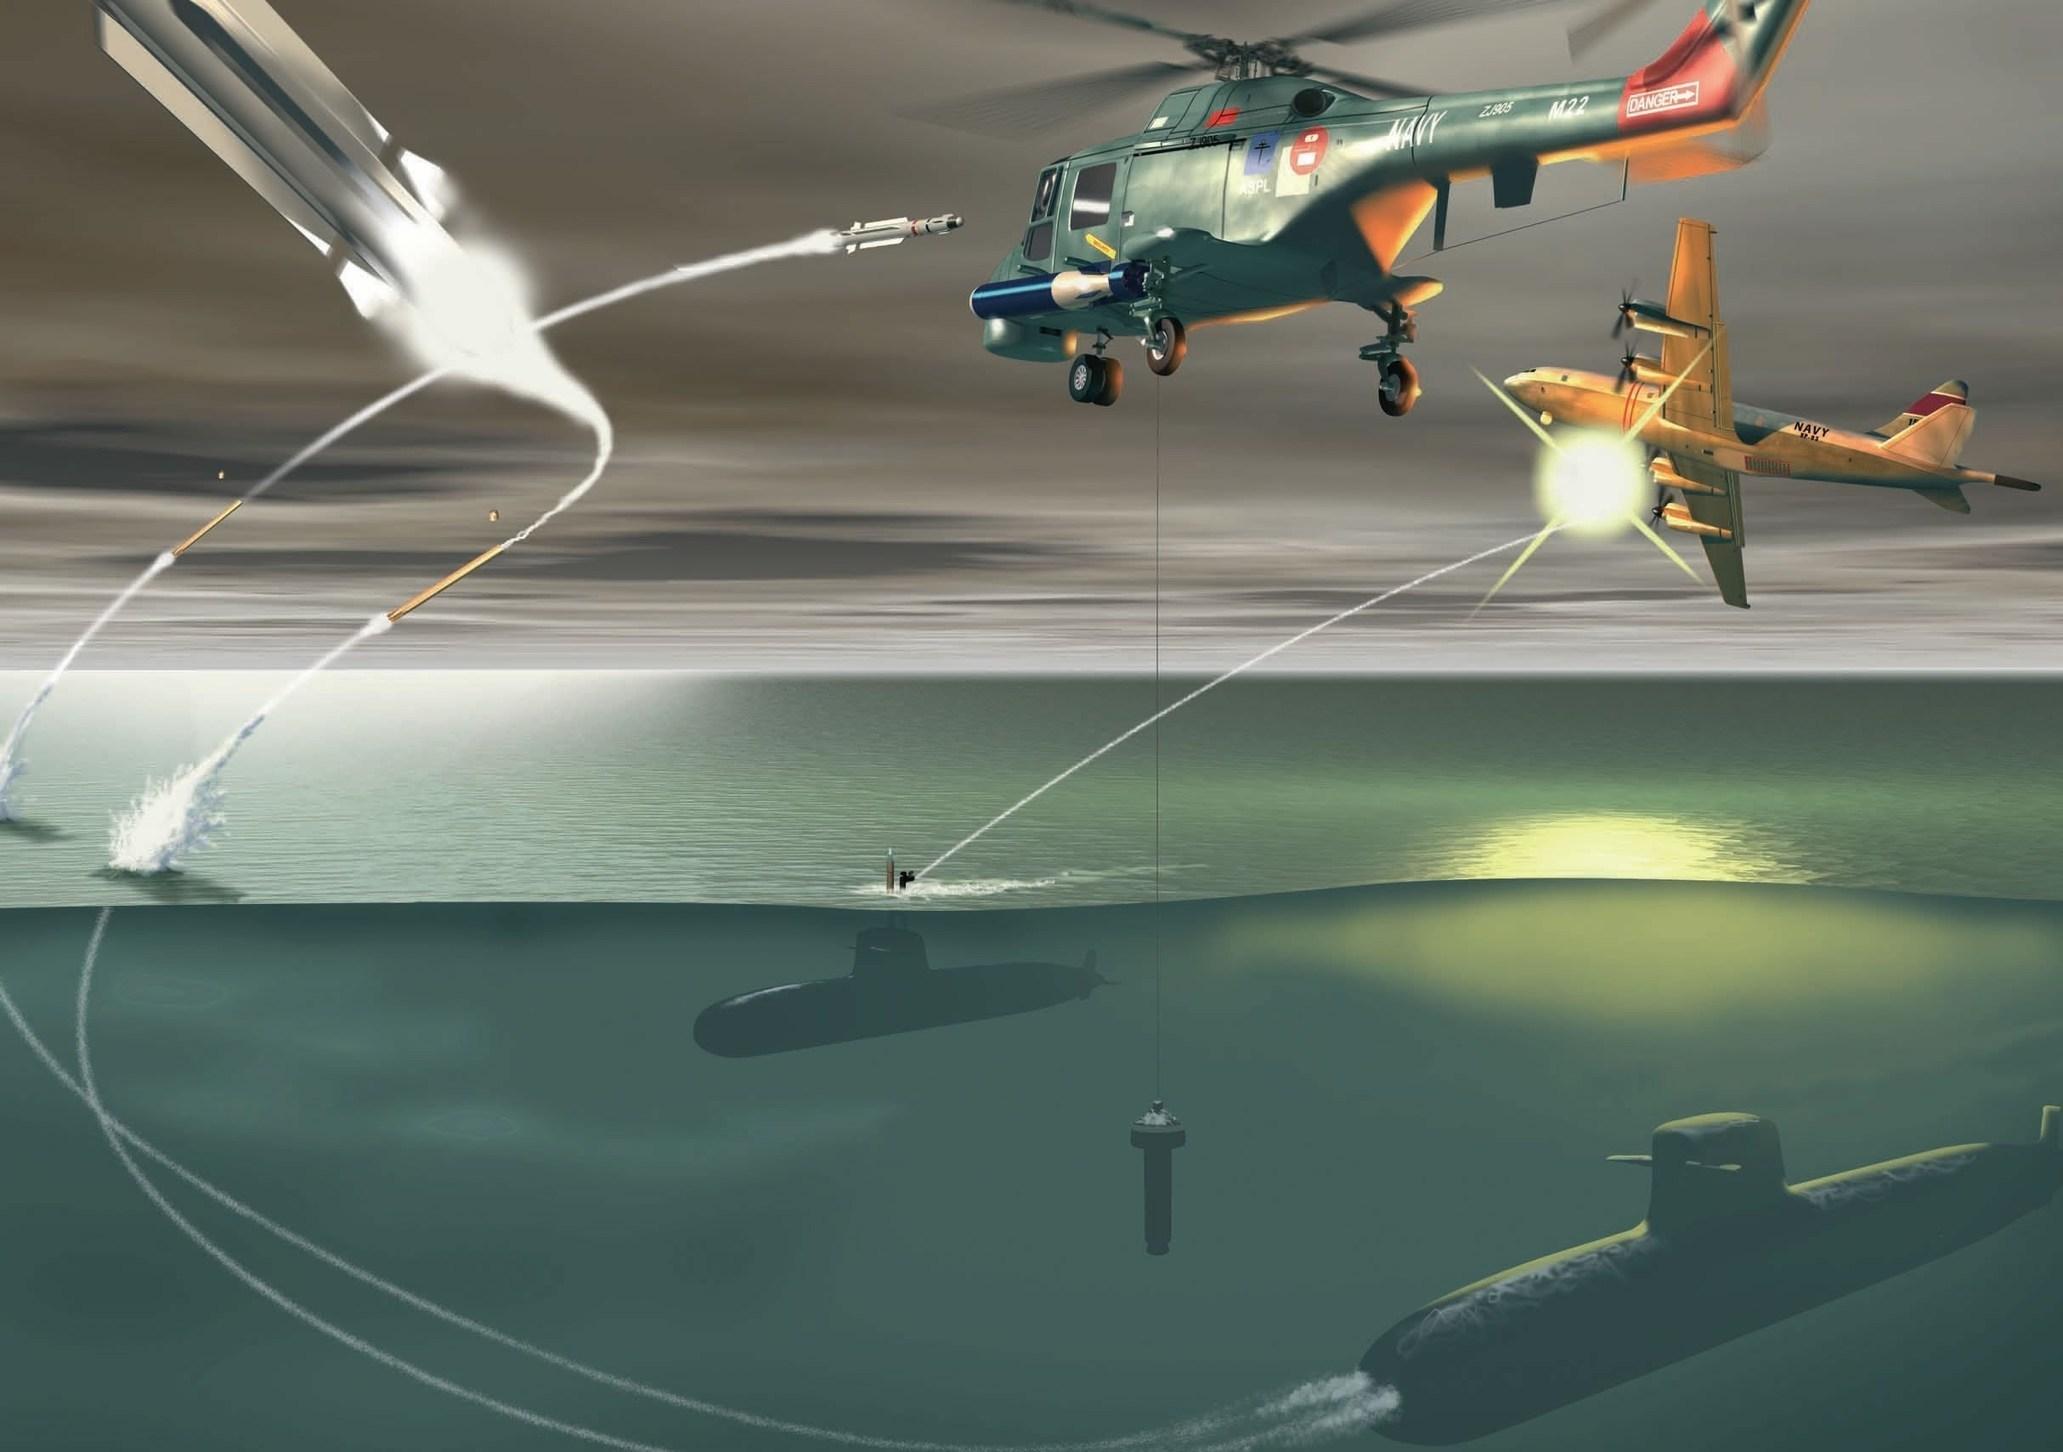 Vídeo: Capacidade de autodefesa antiaérea para submarino